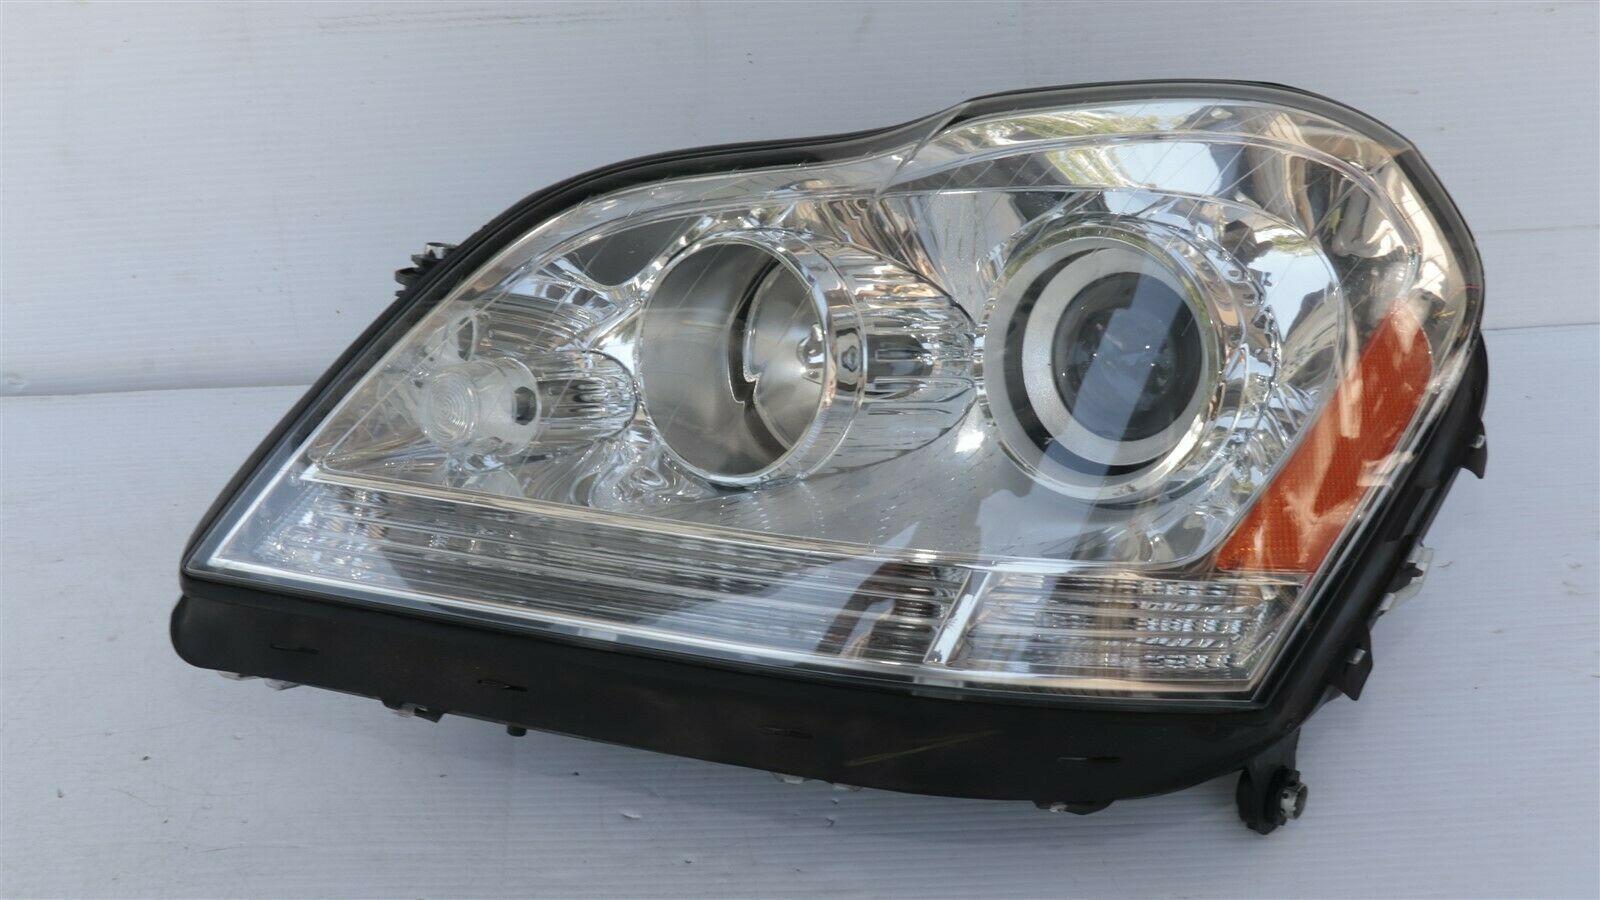 07-12 Mercedes Benz X164 GL350 GL450 Headlight Lamp Halogen Driver Left LH